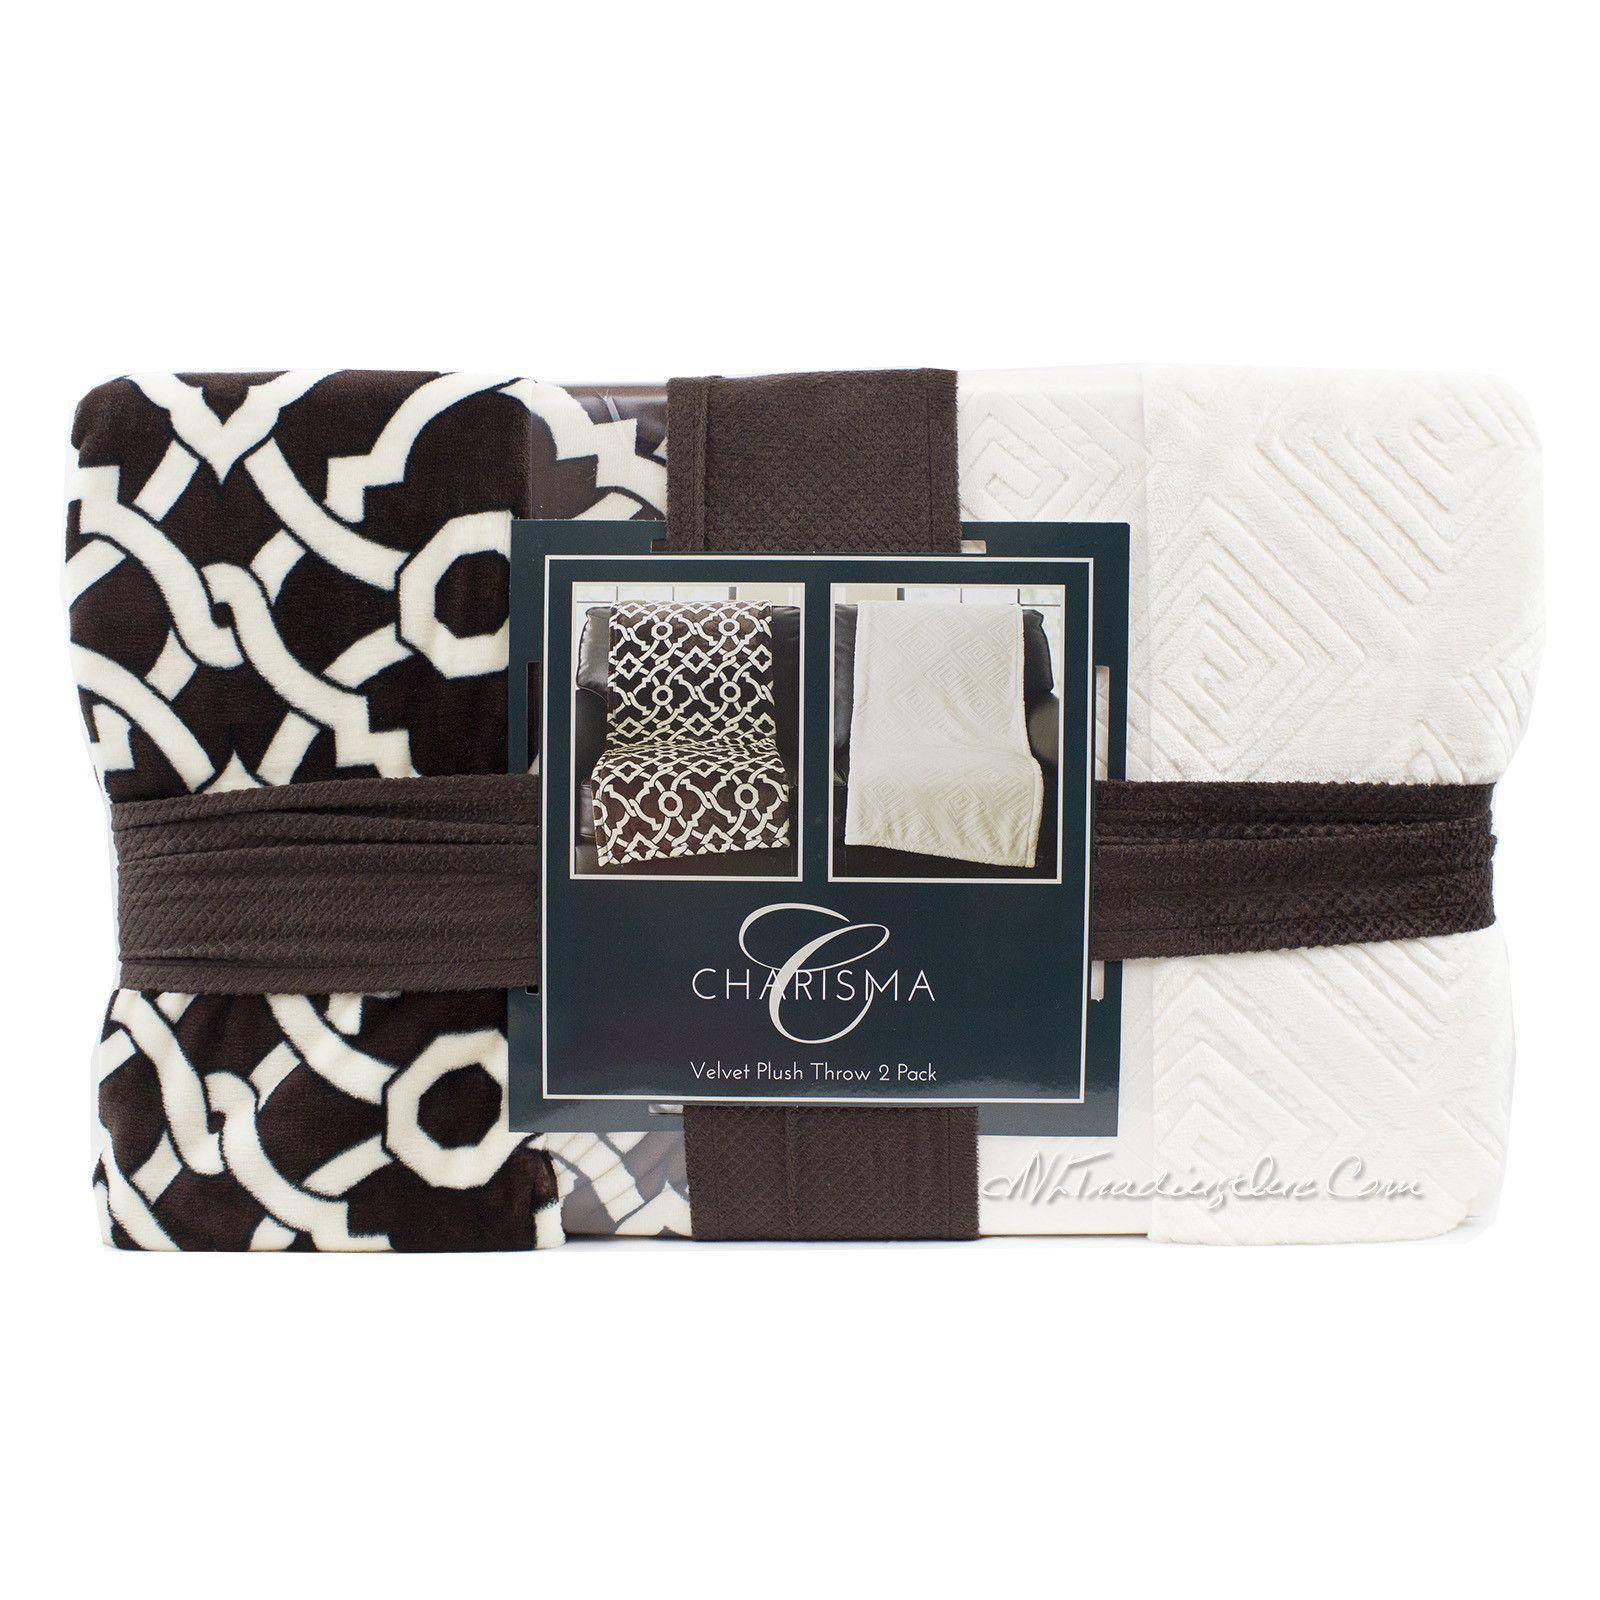 "Charisma Velvet Plush Throw 2 Pack Warm Soft Cozy Oversize Blanket 60x70"""